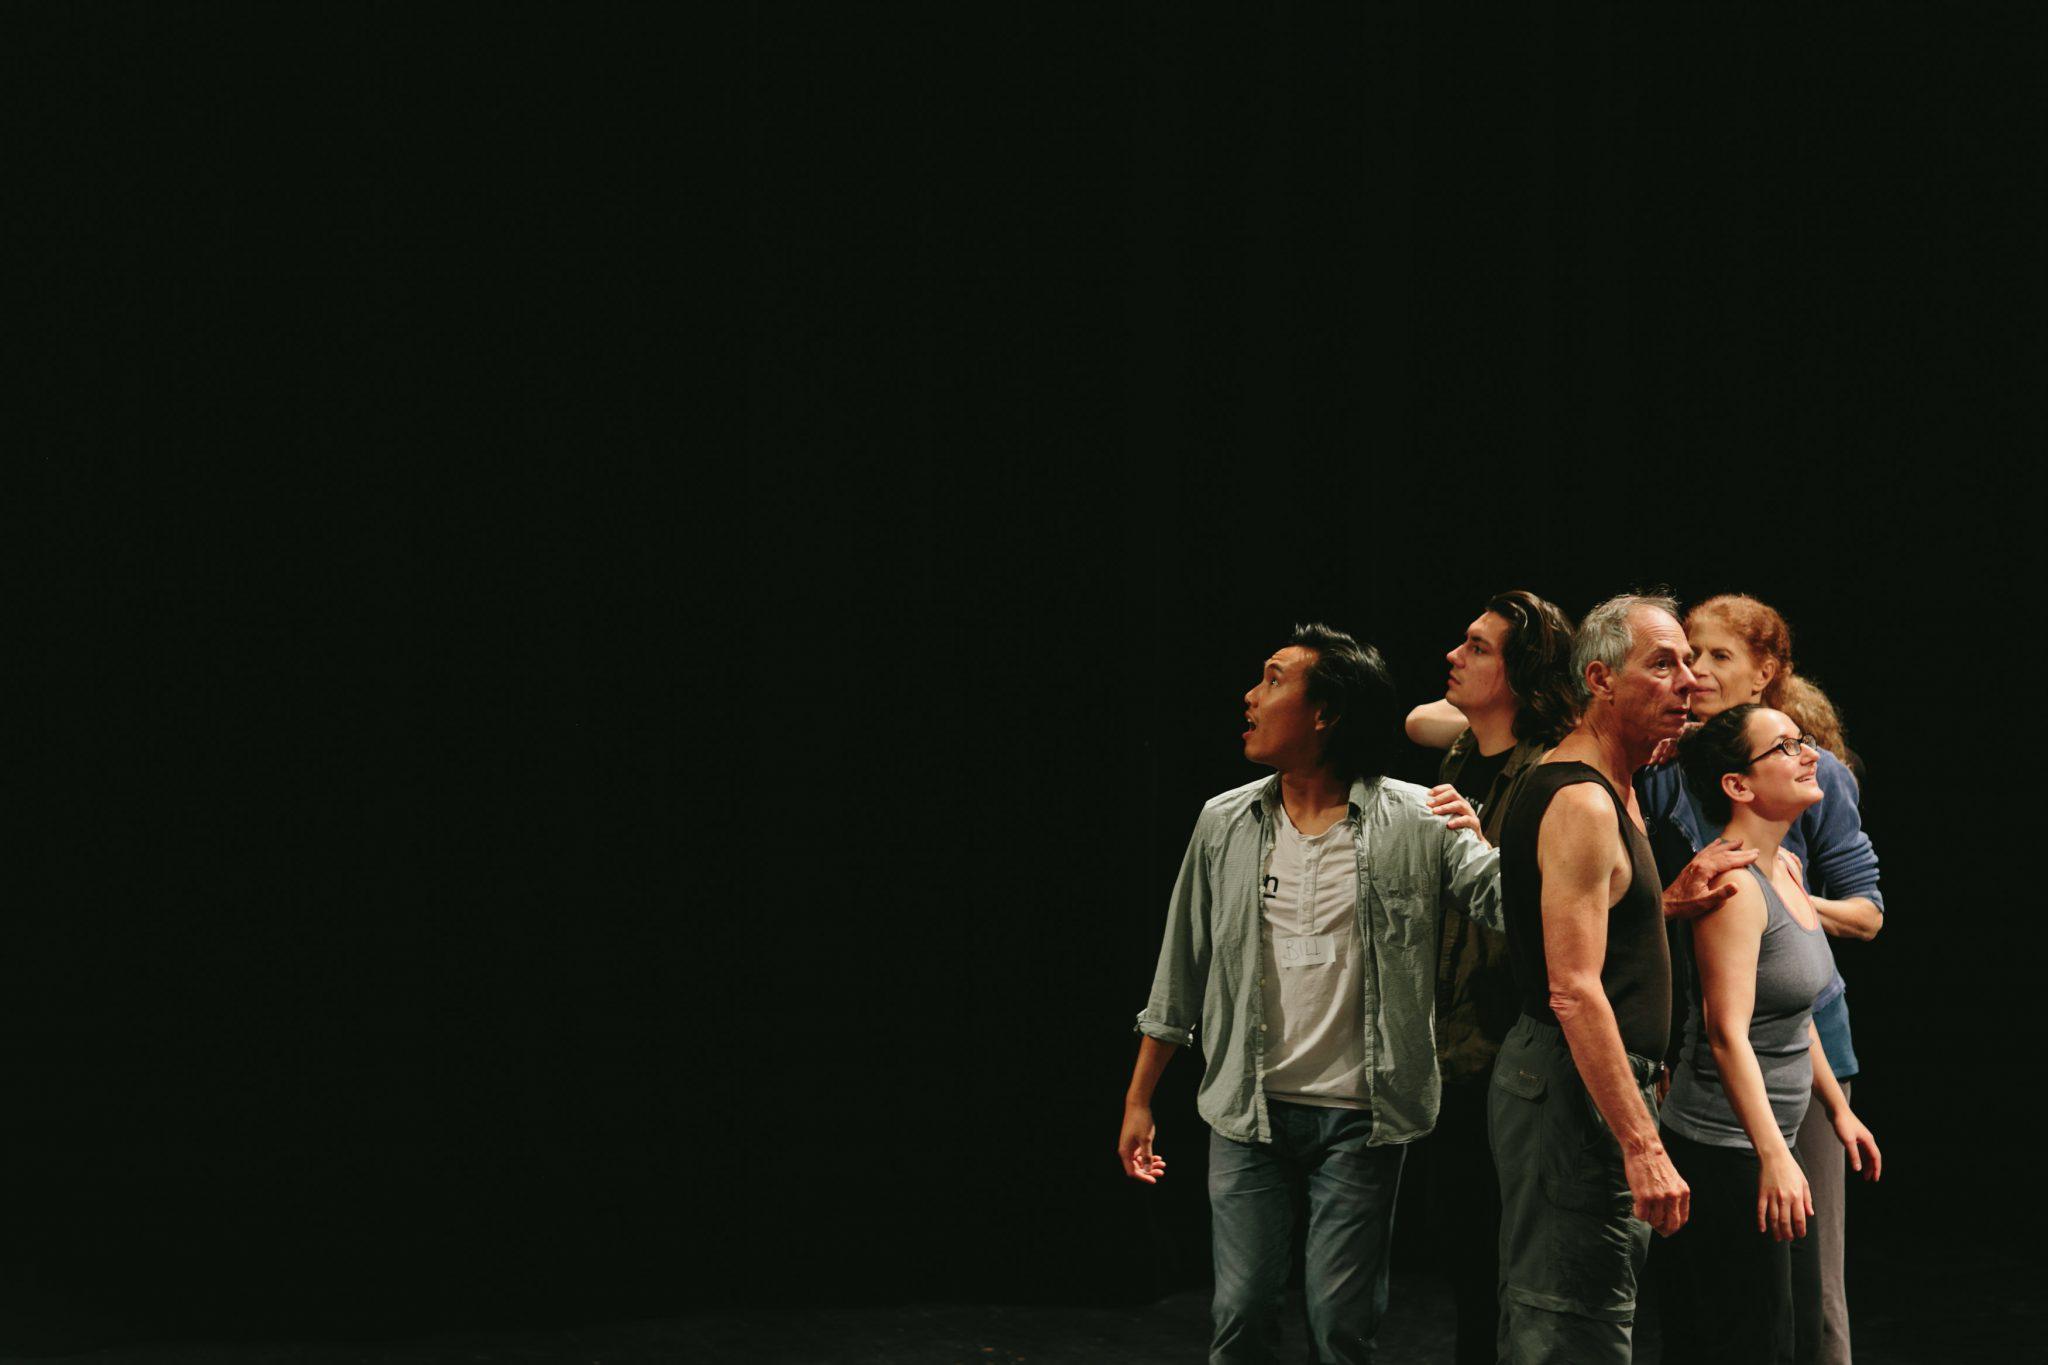 """Brave New World""  Choreography by Shula Strassfled Performers: David Barnet, Becca Barrington, Stuart Kandall, Barry Bilinsky, Shula Strassfeld & Bill Yong Photo by Mat Simpson"